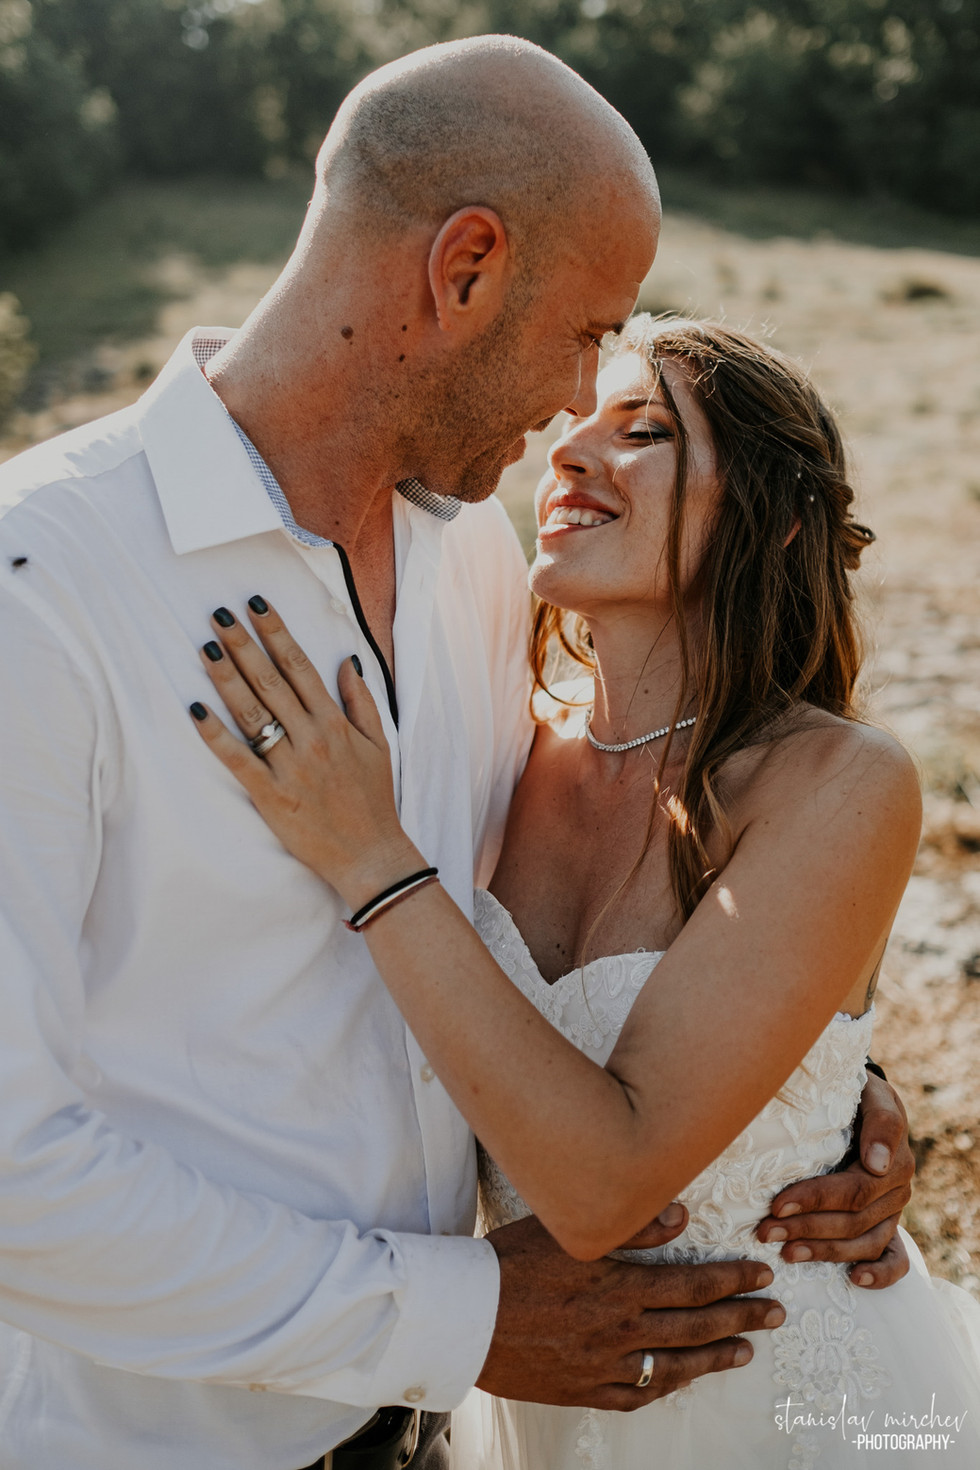 Сватбен фотограф | Станислав Мирчев